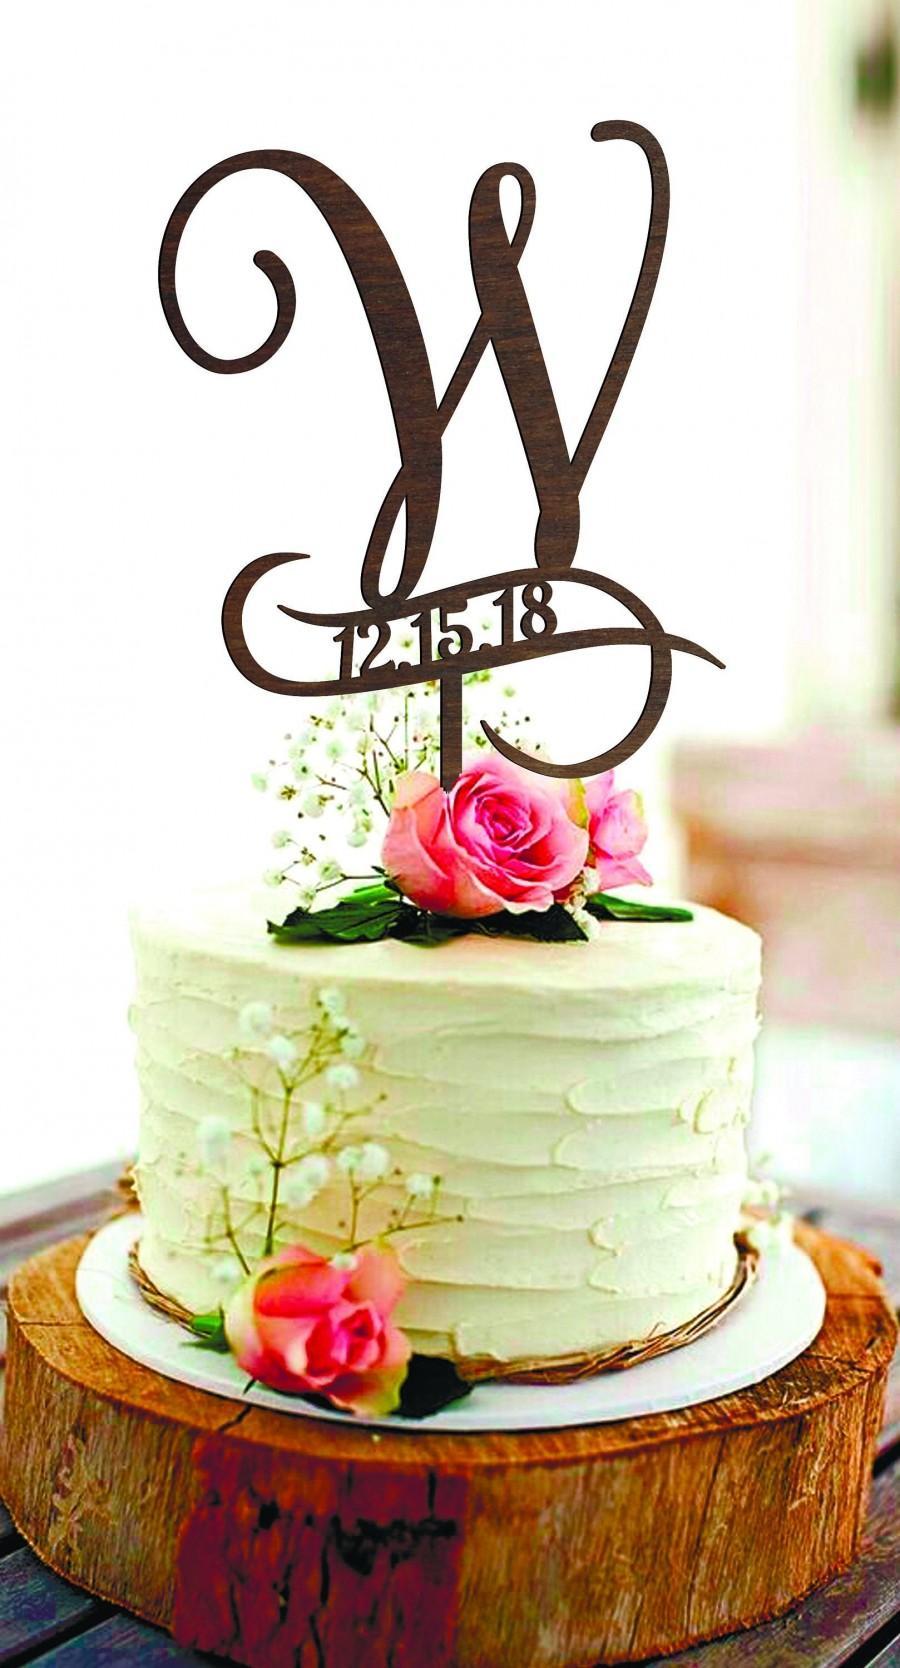 Wedding - Cake Topper W Сake topper Rustic weding Cake Topper Personalized cake topper date Initial cake topper wood letter W Cake toppers for wedding